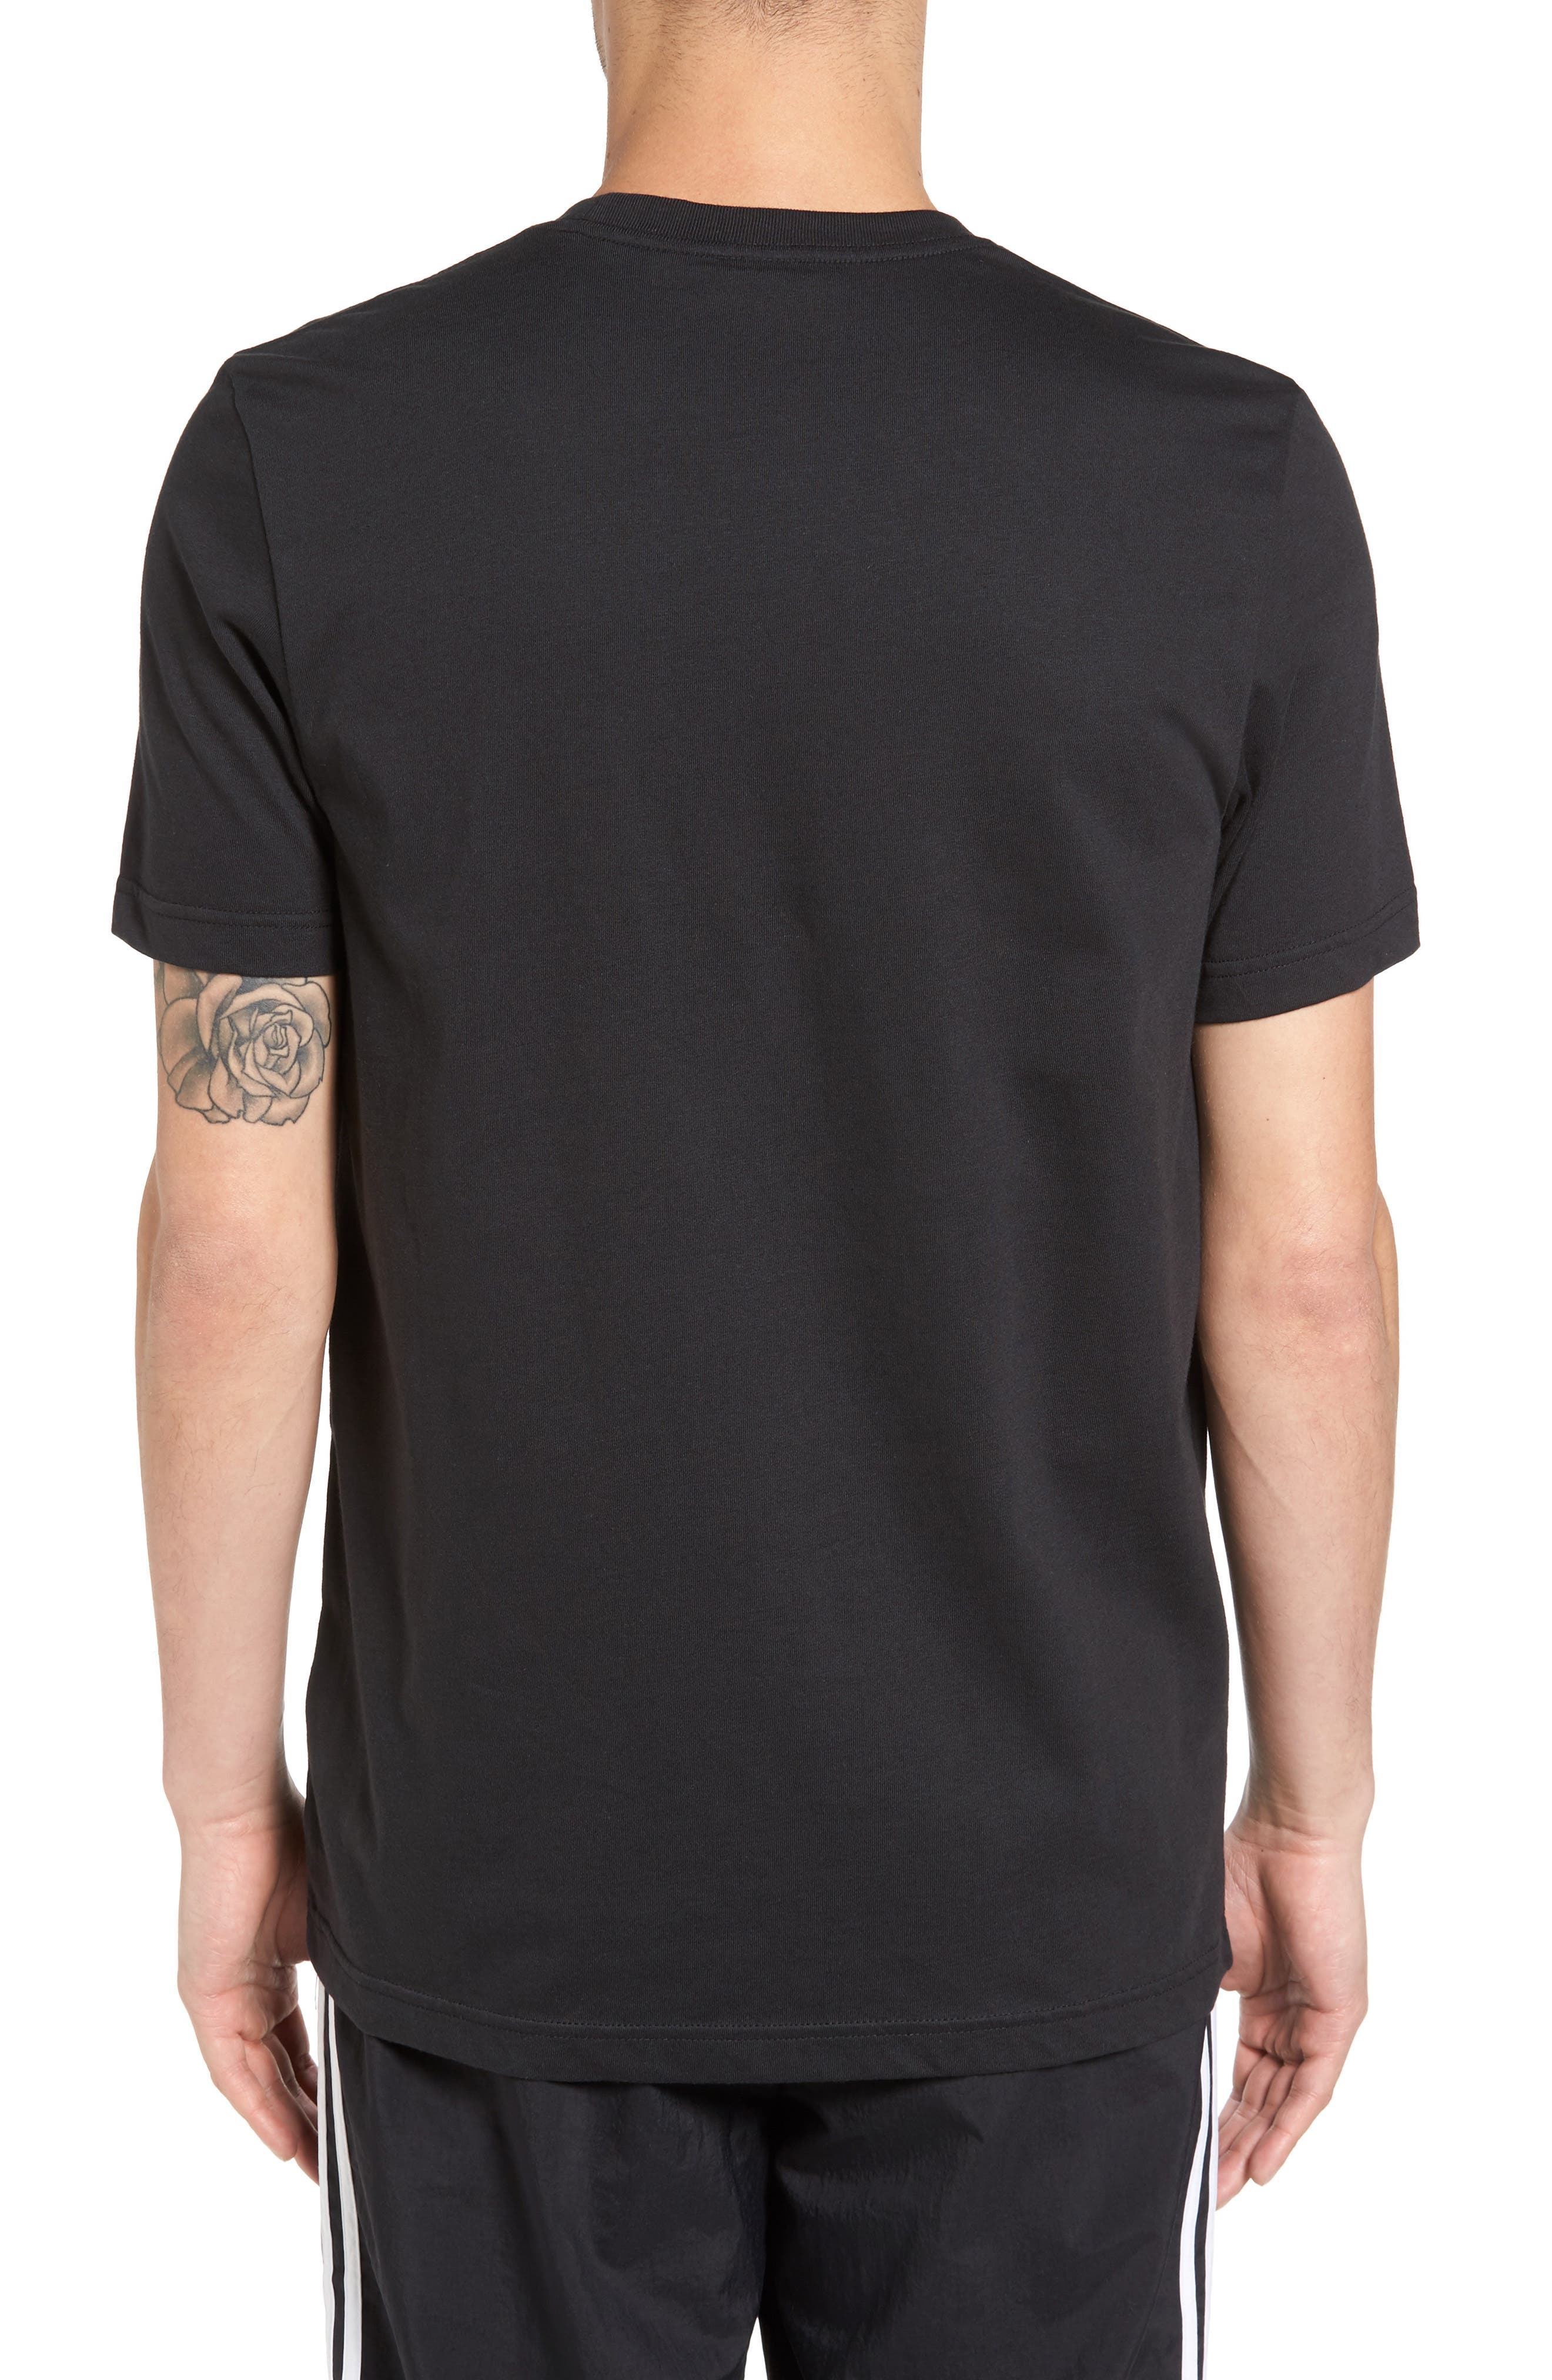 Trefoil Graphic T-Shirt,                             Alternate thumbnail 2, color,                             Black